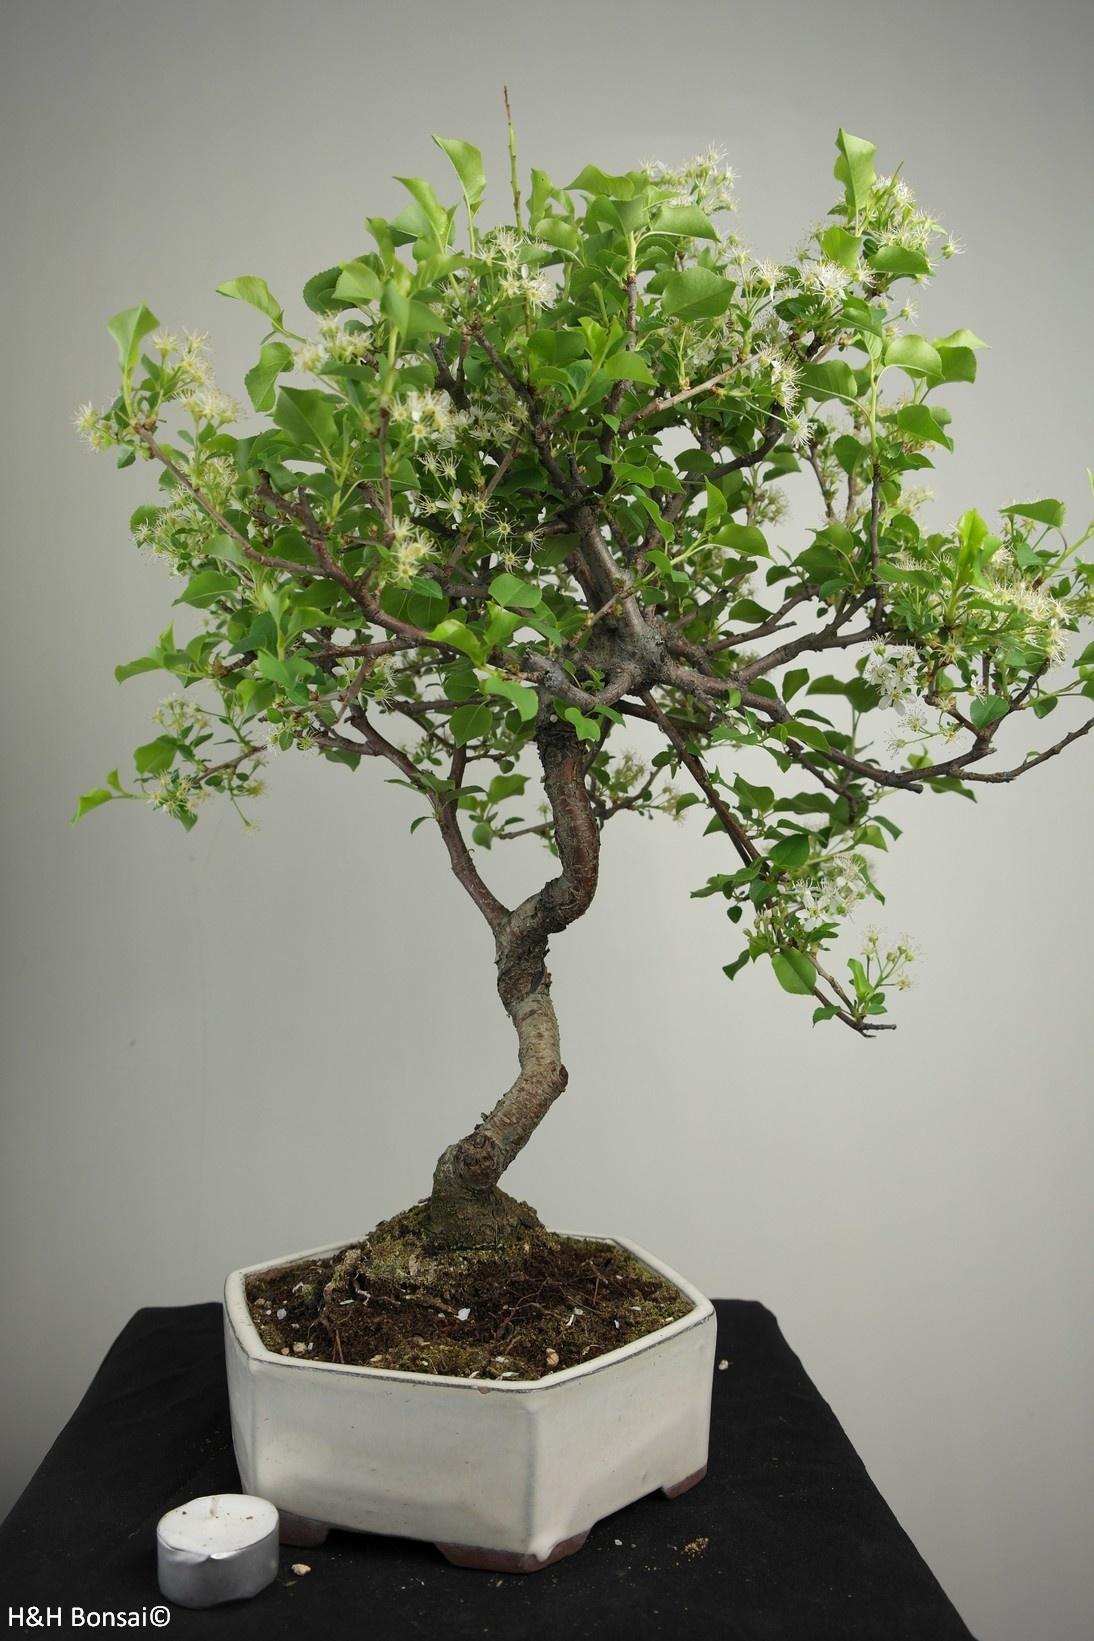 Bonsai Ciliegio canino, Prunus mahaleb, no. 7669